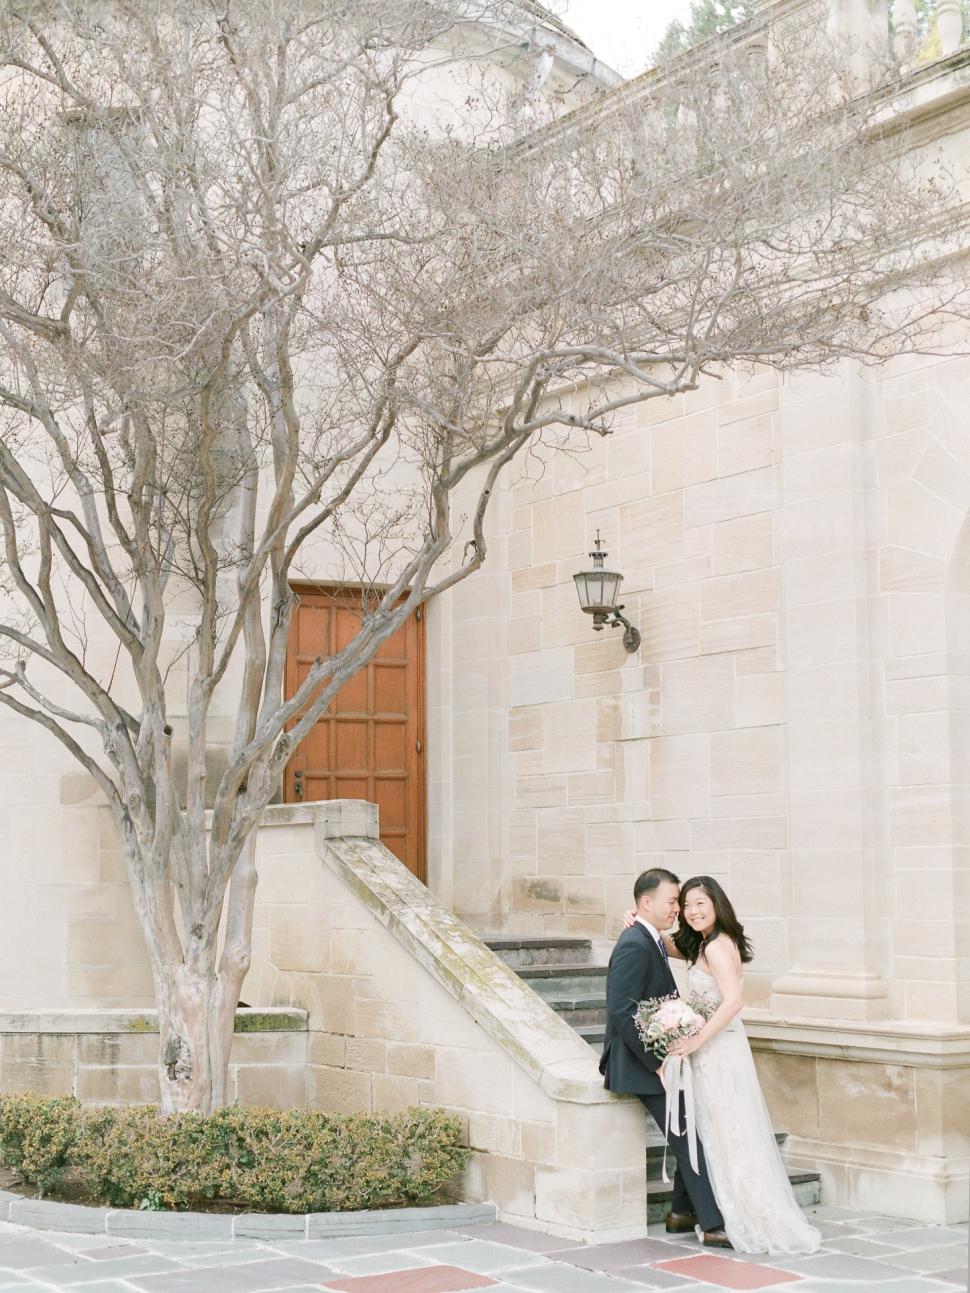 Southern-California-Wedding-Photographer-Cassi-Claire-Greystone-Mansion-Beverly-Hills-CA-wedding_09.jpg